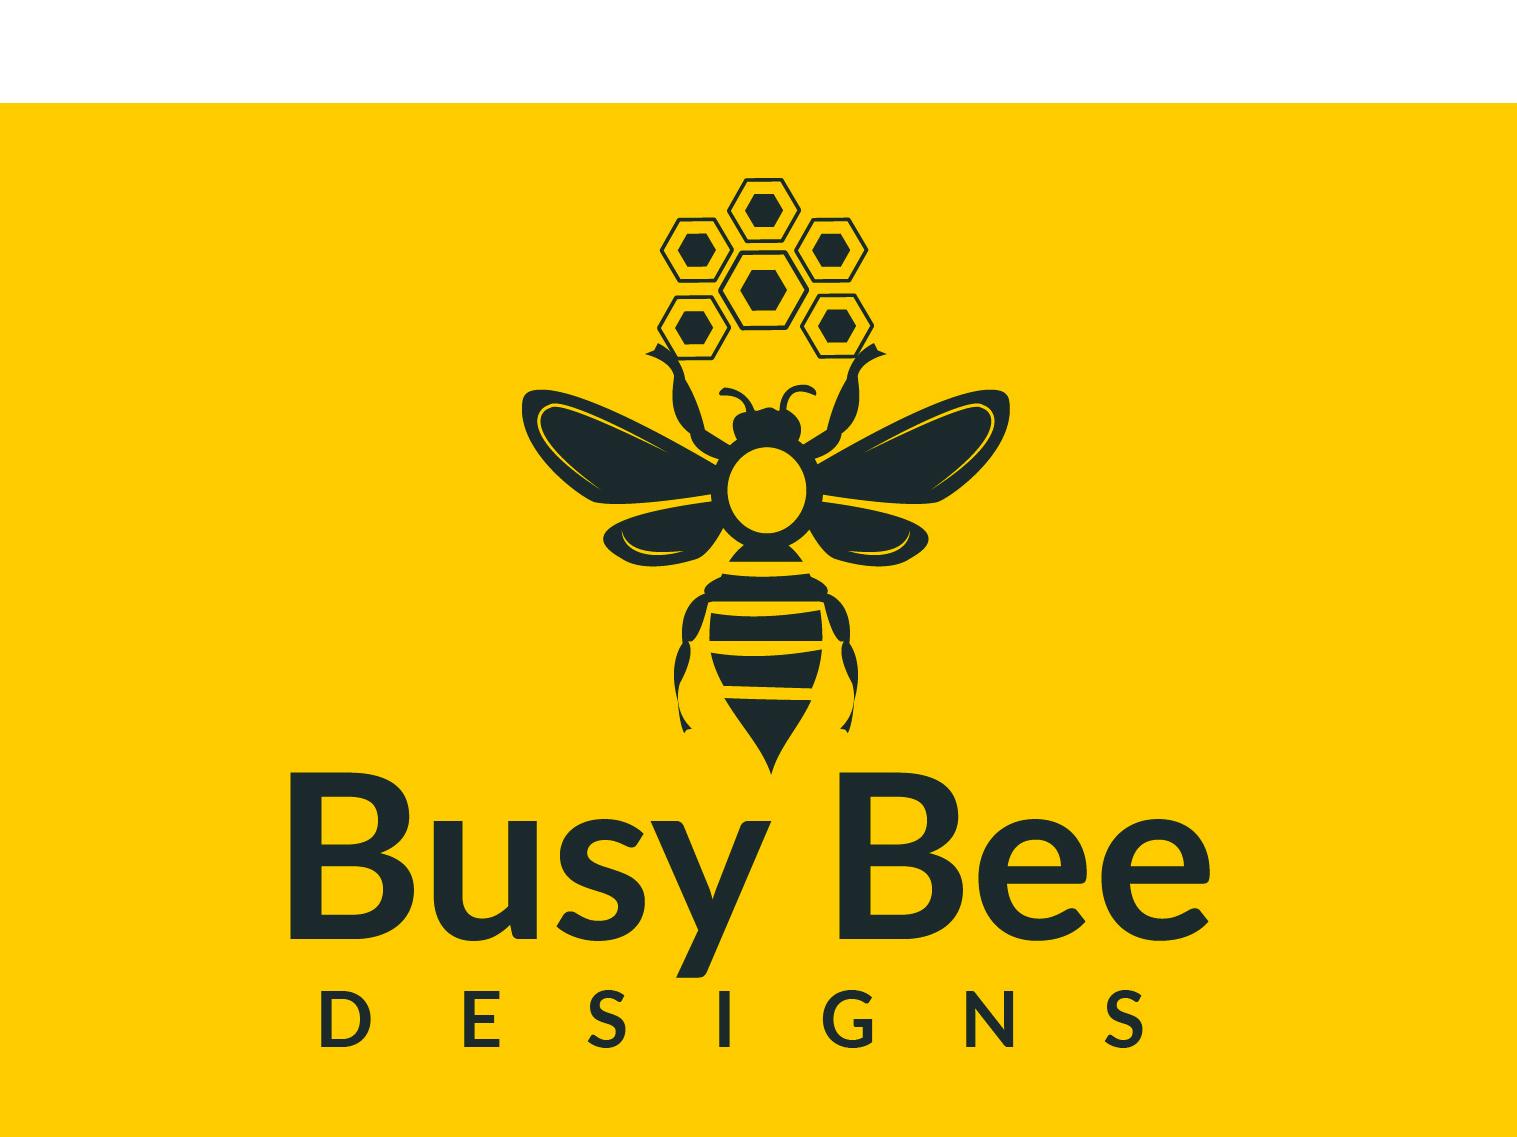 Bee Logo branding creative design market place company busines card photoshop market identity brand unique mordern minimal business vector flat icon logo design logo graphic design